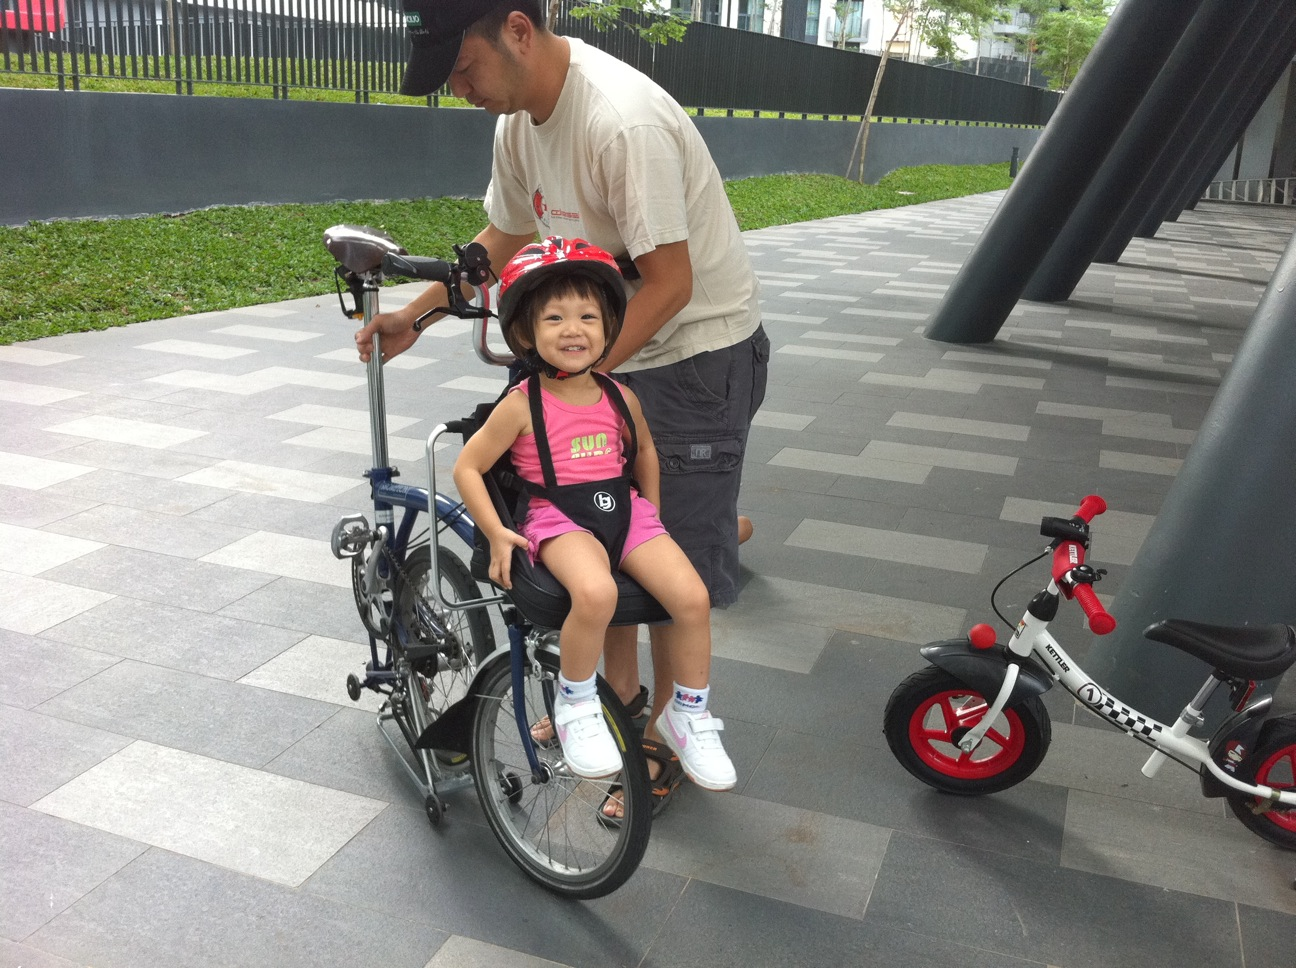 Baby chair on bike - Baby Chair On Bike 21